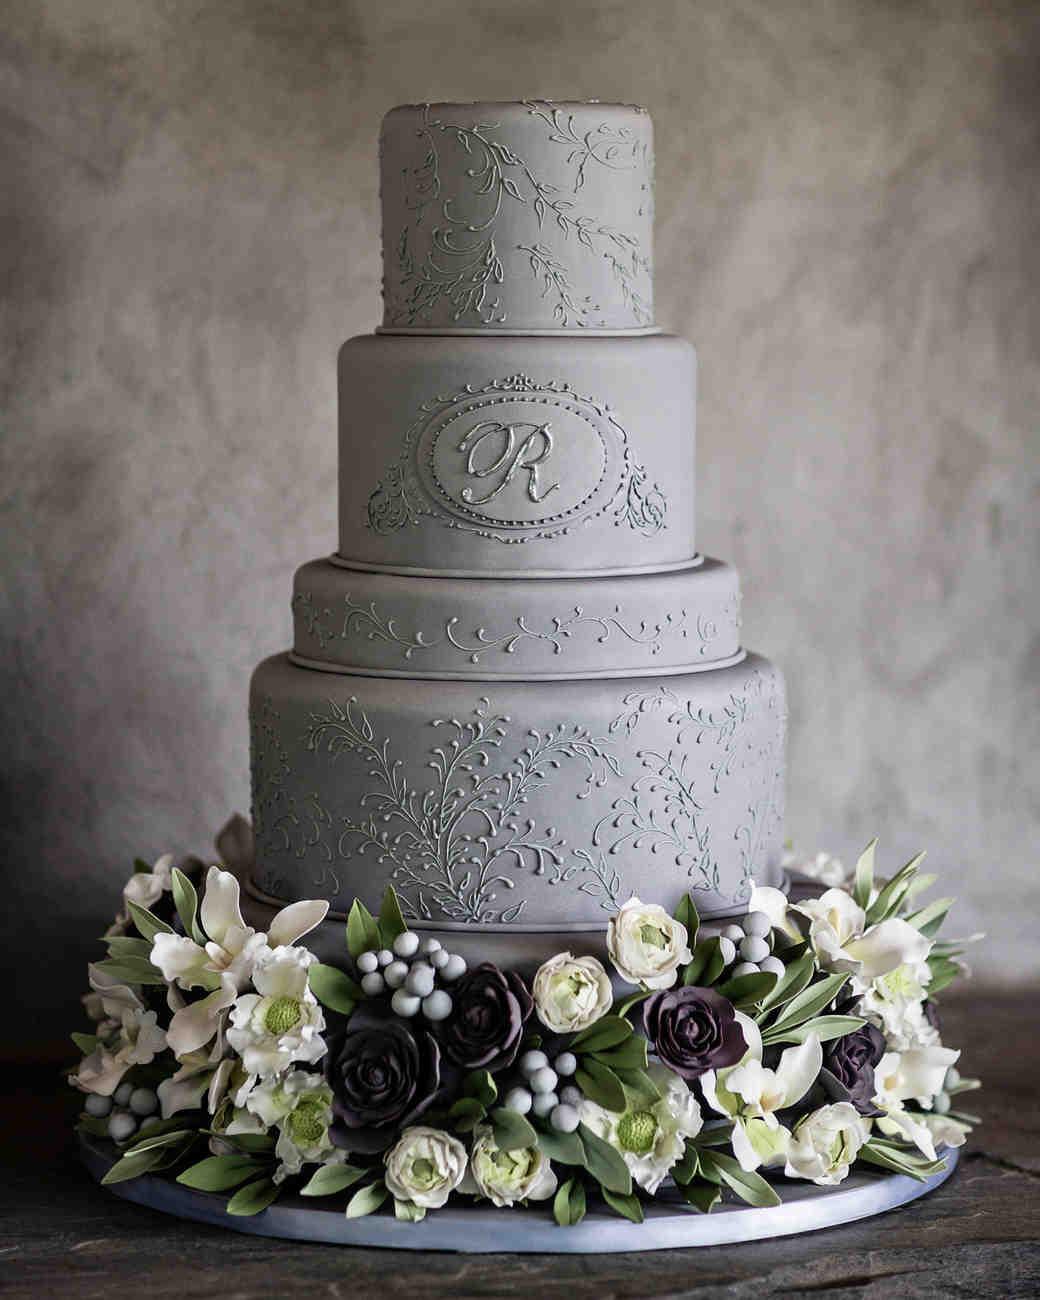 Wedding Cakes Nyc  Top East Coast Wedding Cake Pros